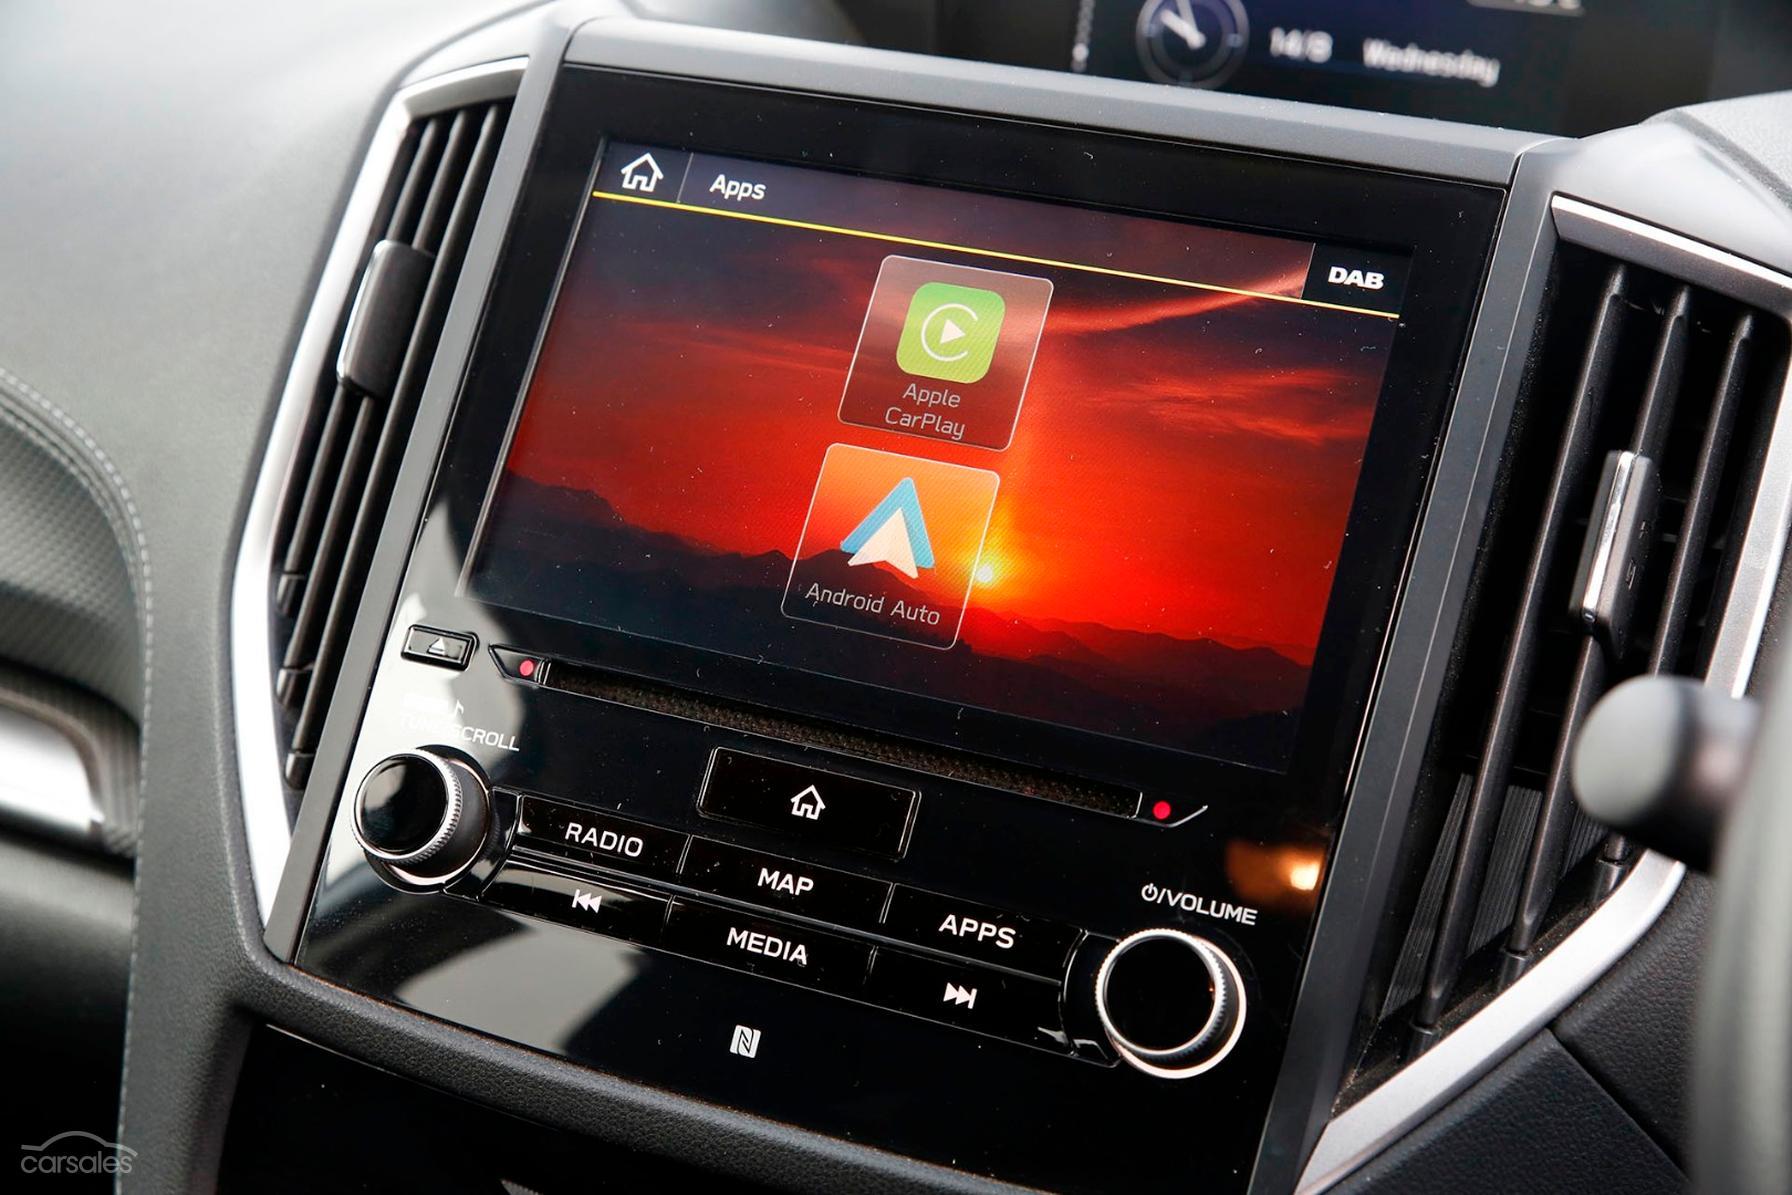 2018 Subaru Forester 2 5i Premium S5 Auto AWD MY19-OAG-AD